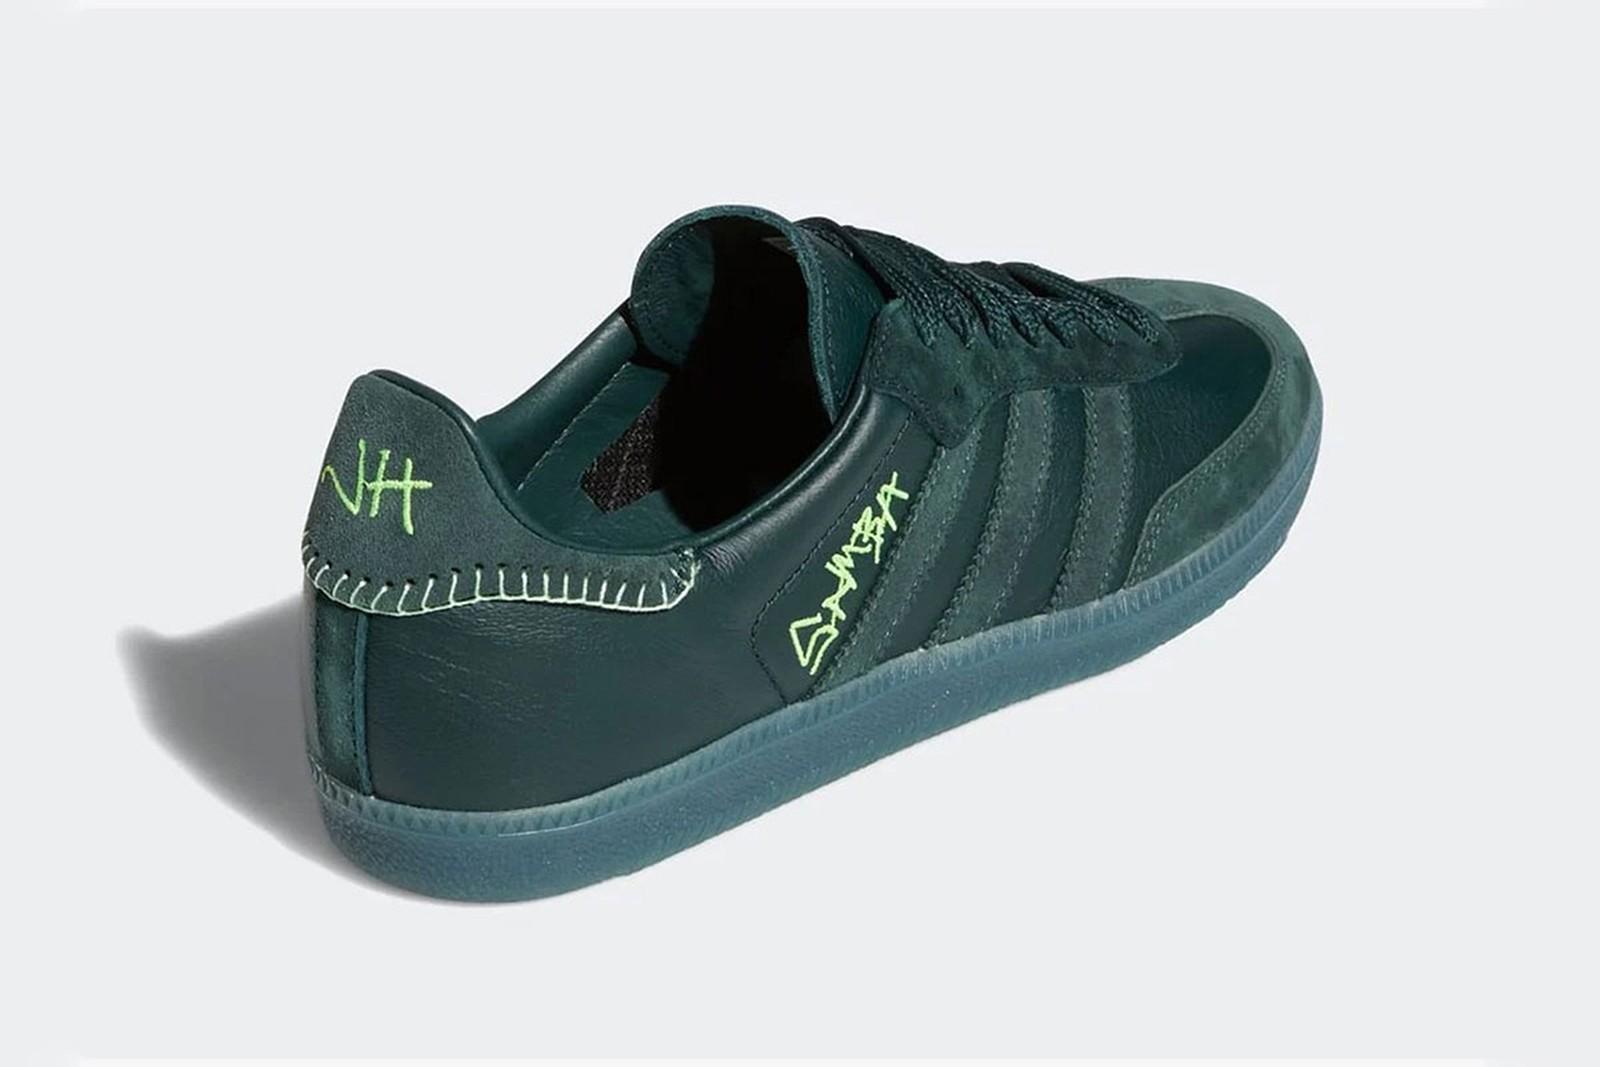 jonah-hill-adidas-dtf-magazine9